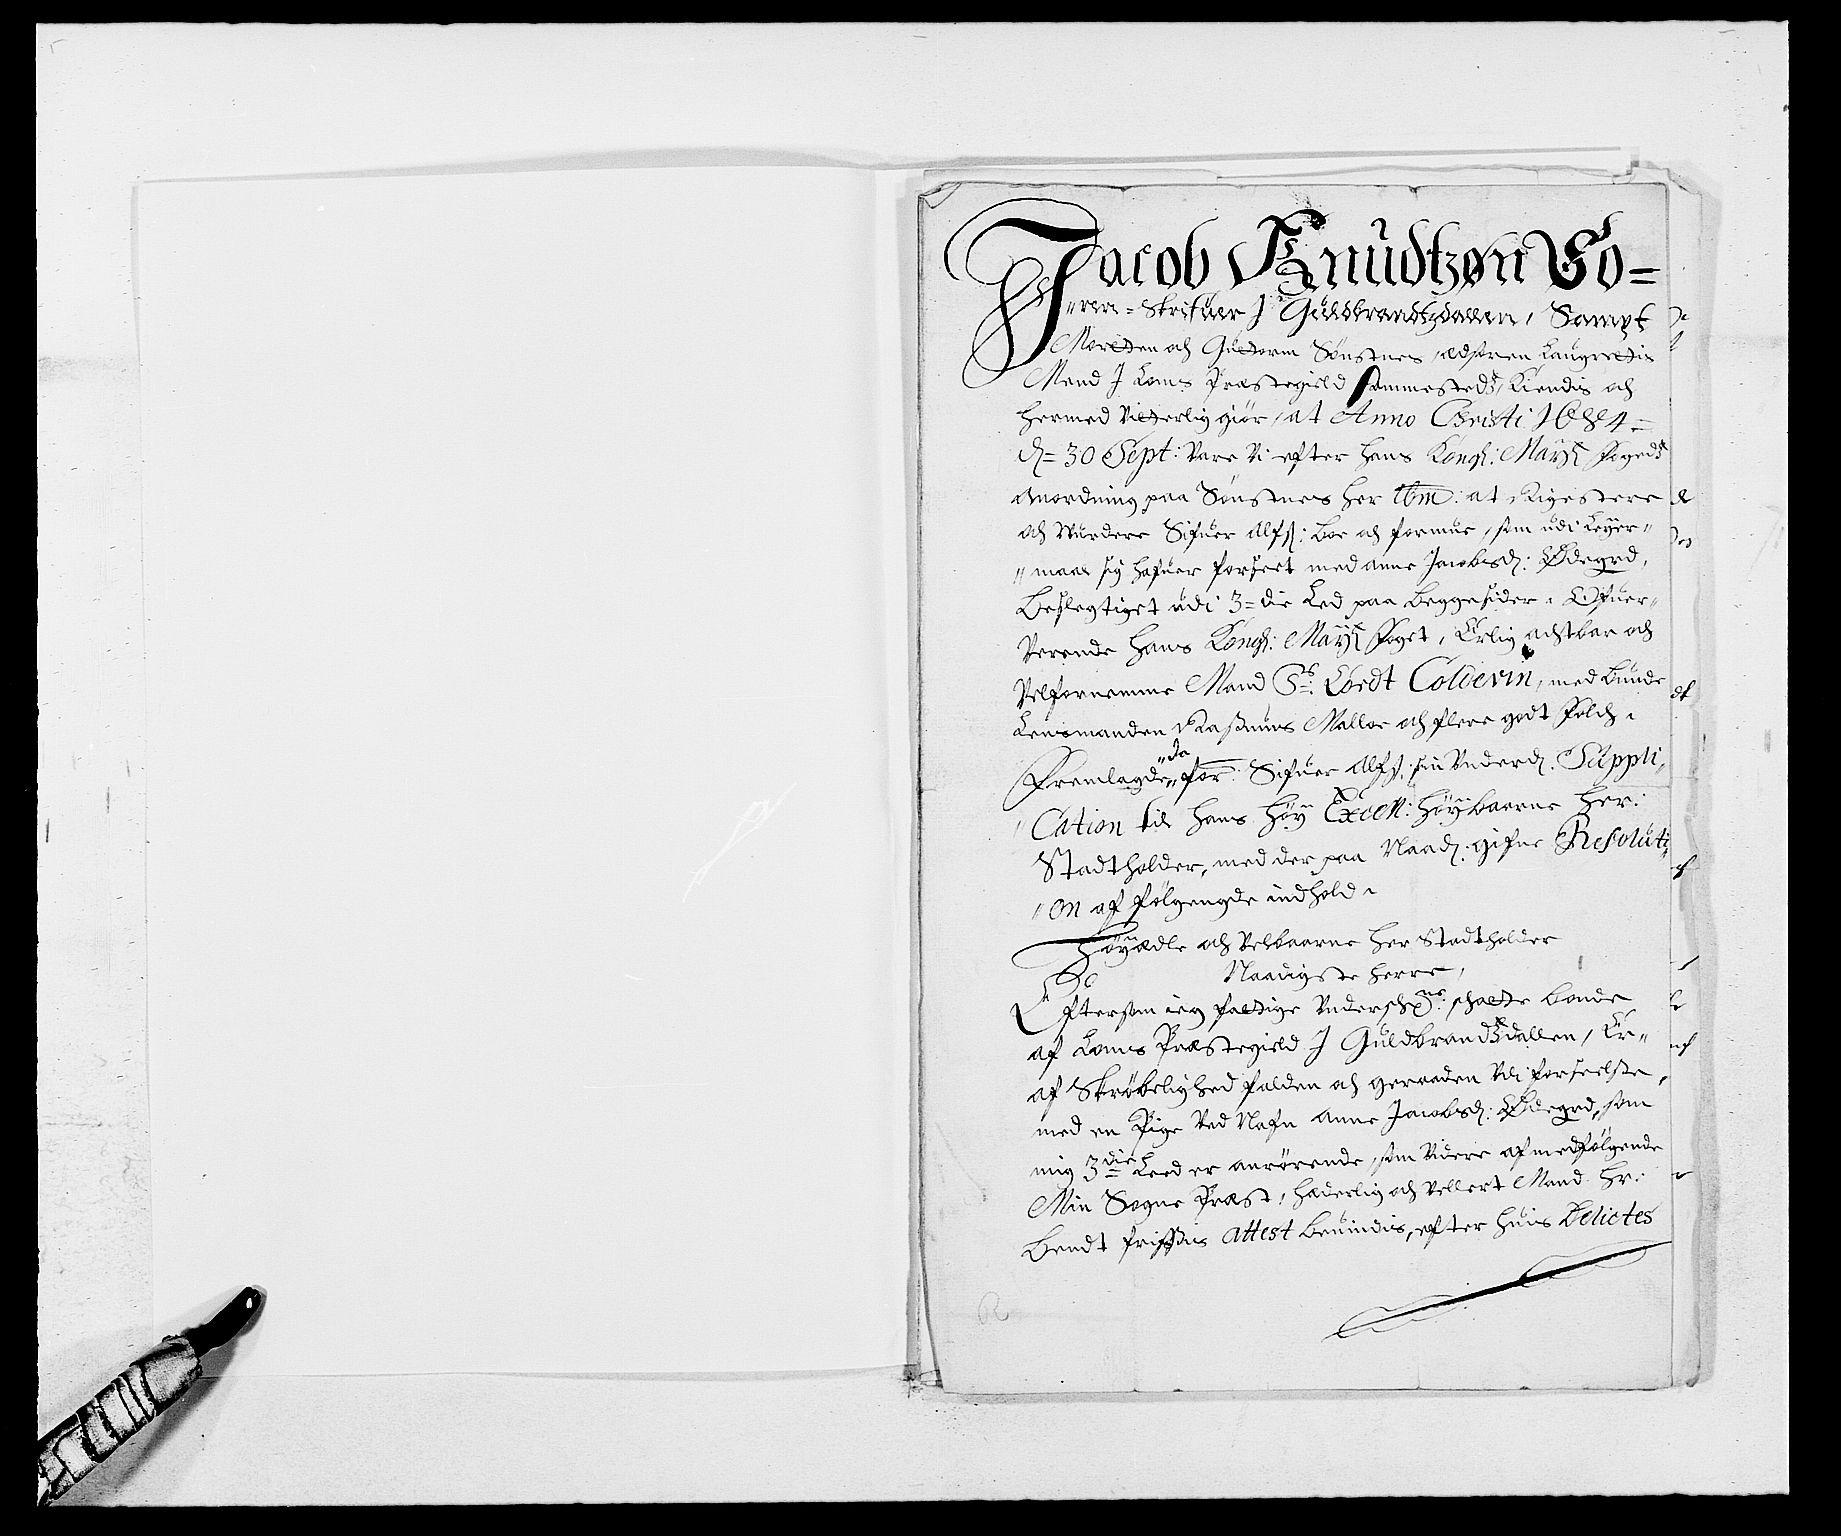 RA, Rentekammeret inntil 1814, Reviderte regnskaper, Fogderegnskap, R17/L1159: Fogderegnskap Gudbrandsdal, 1682-1689, s. 304